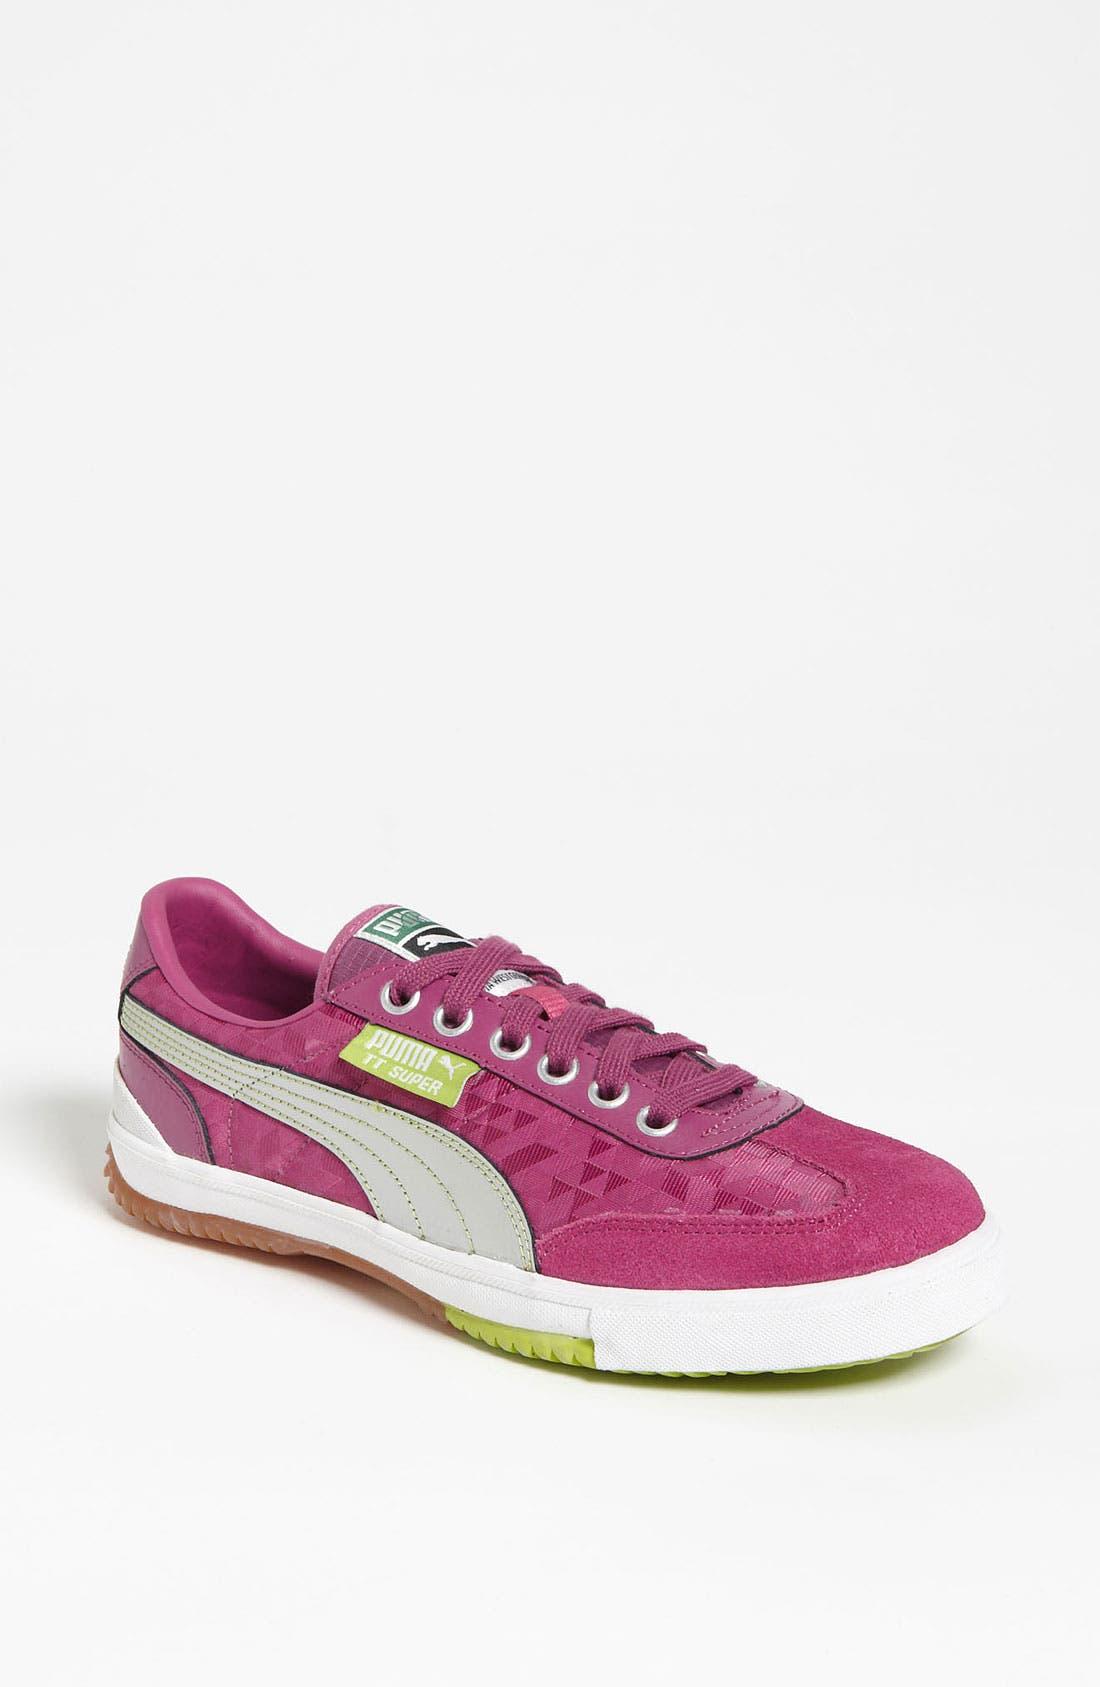 Alternate Image 1 Selected - PUMA 'TT Super Ripstop' Sneaker (Women)